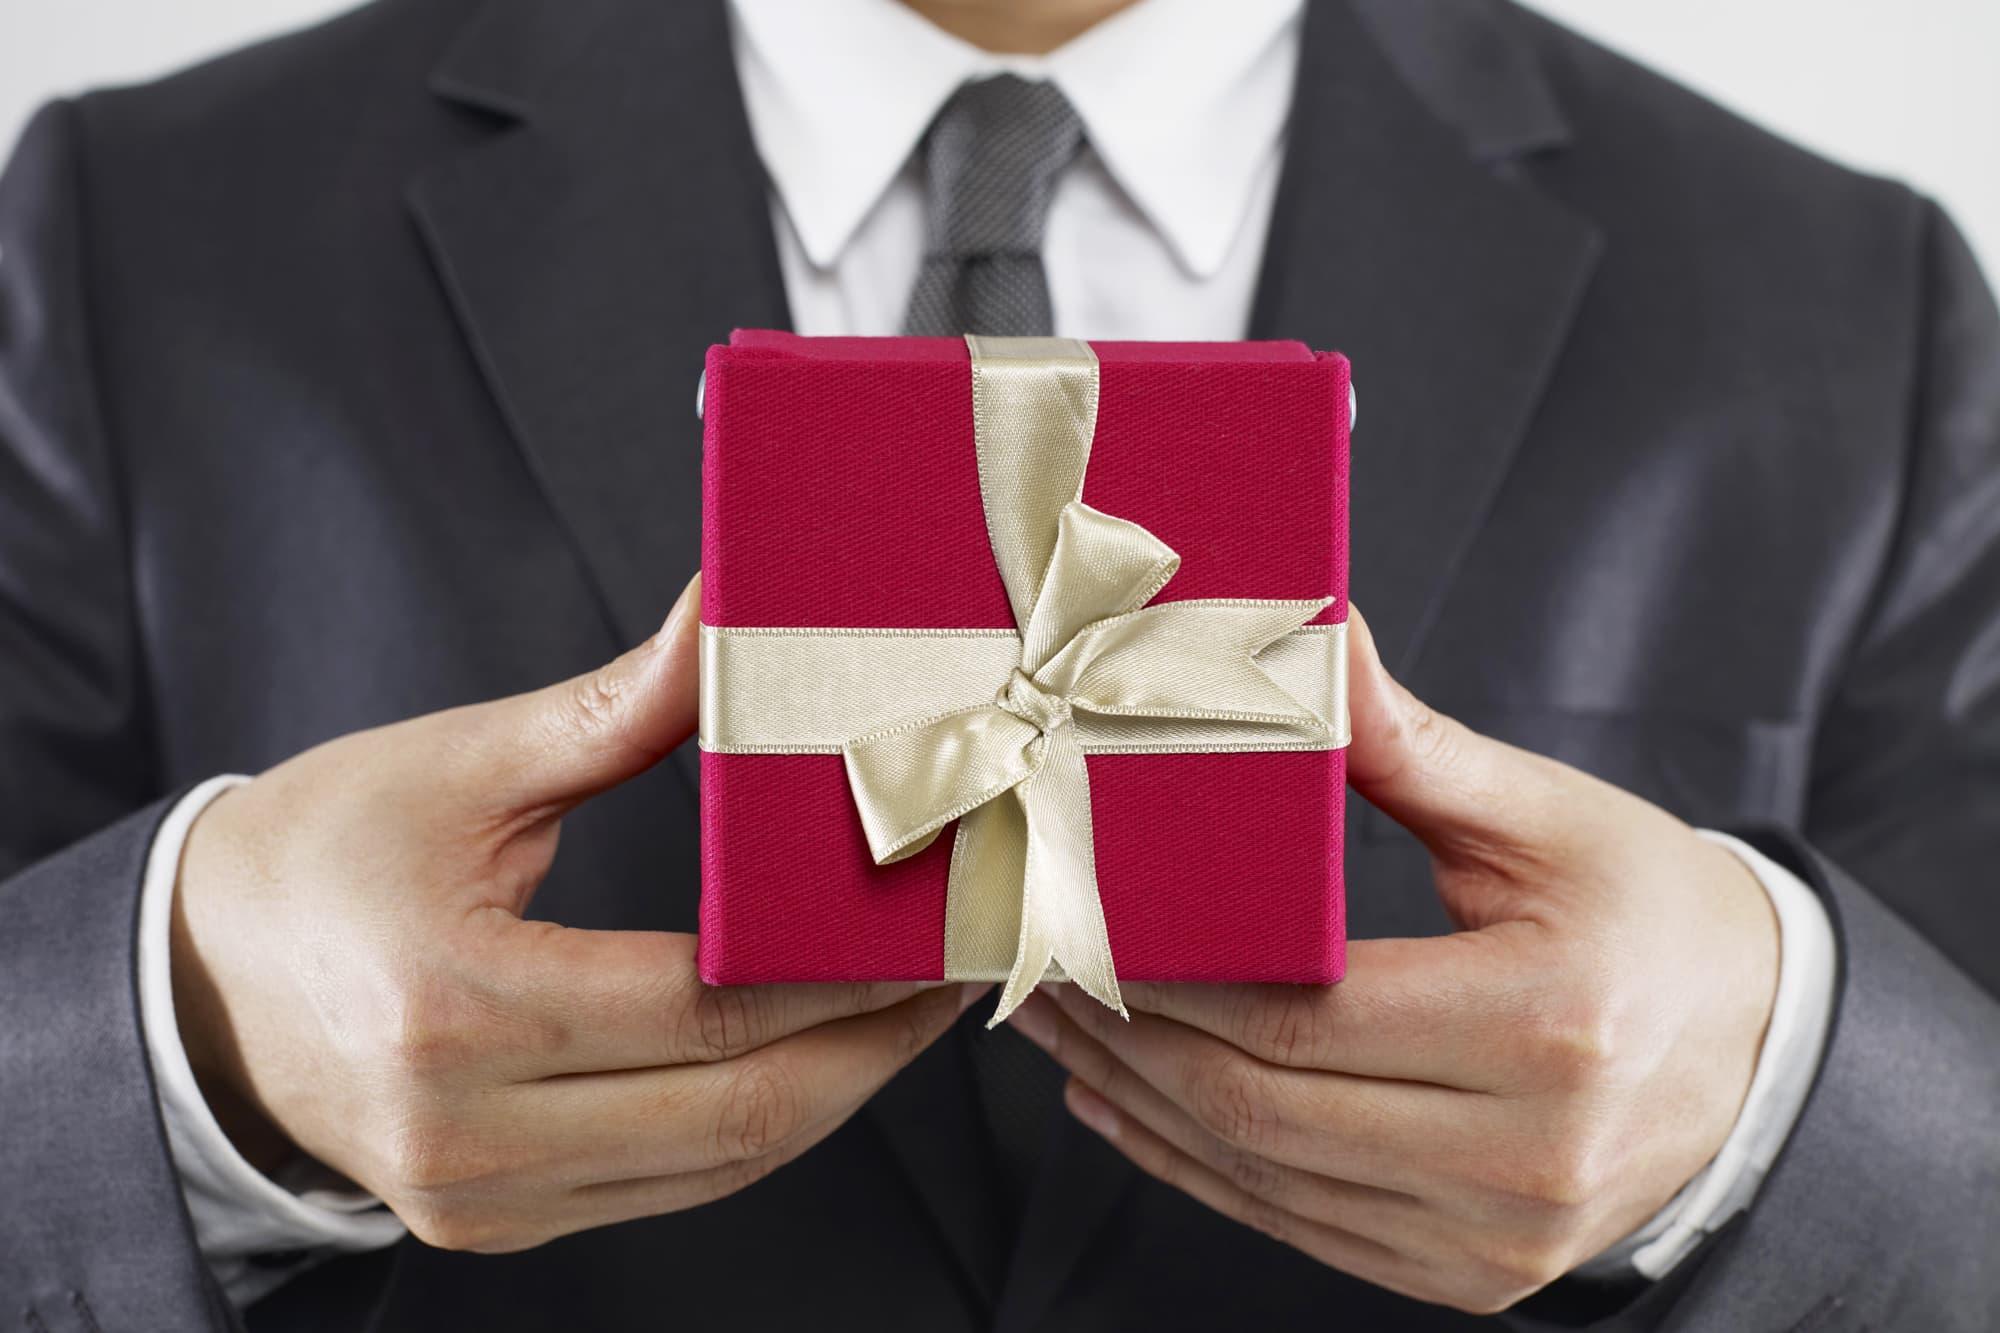 Подарок руководителю мужчине от коллектива